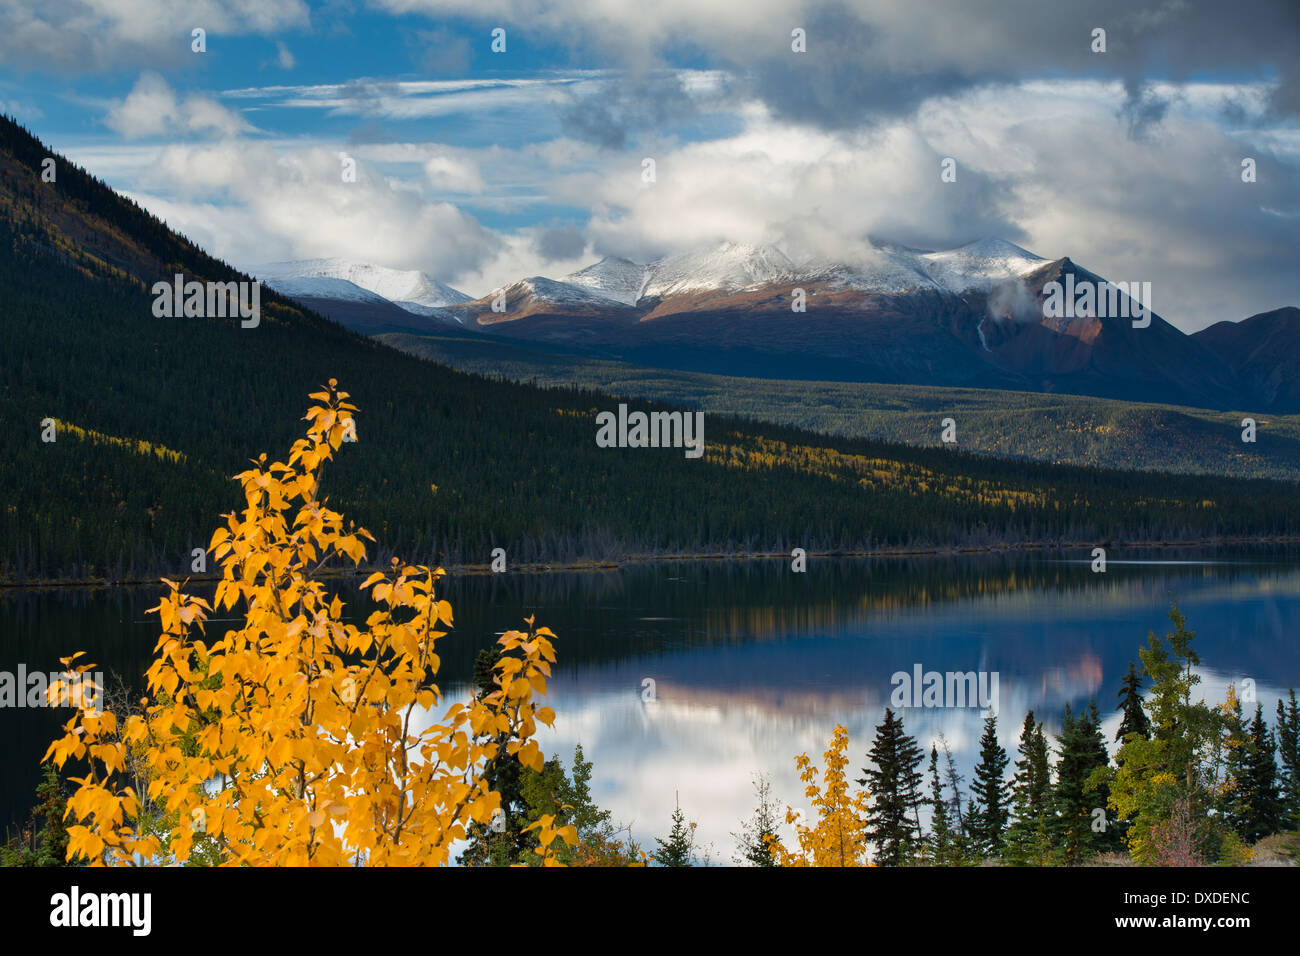 Herbstfärbung bei Nares Lake mit Montana Berg darüber hinaus, in der Nähe von Carcross, Yukon Territorien, Kanada Stockbild